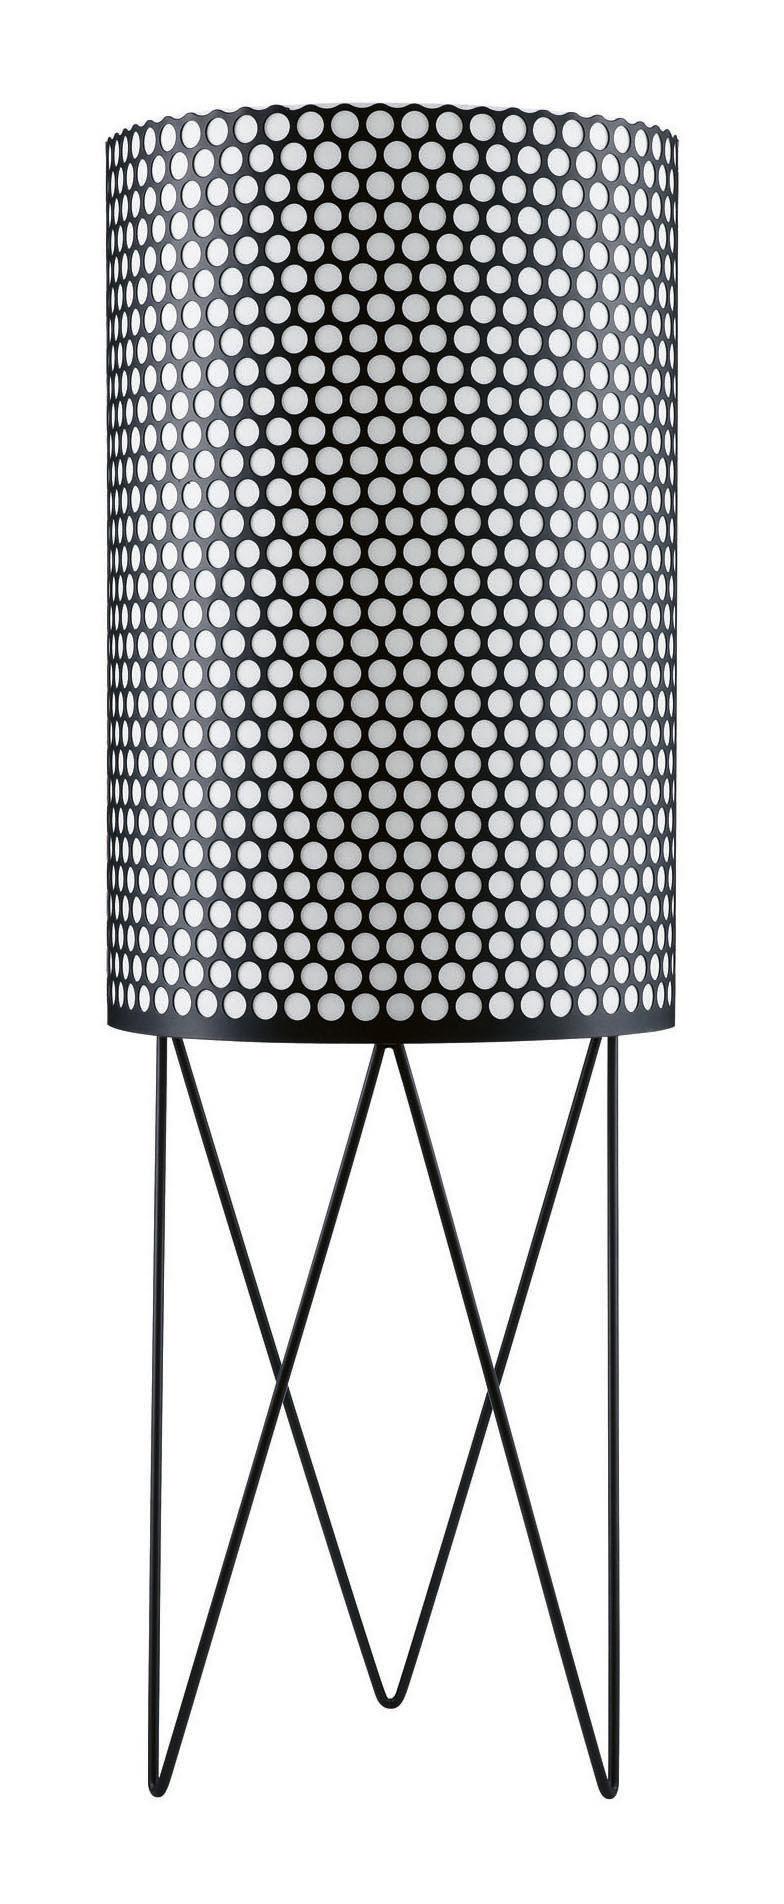 Lighting - Floor lamps - Pedrera Floor lamp - Ø 39 x H 113 cm - Reissue 1955 by Gubi - Black - Metal, Polythene